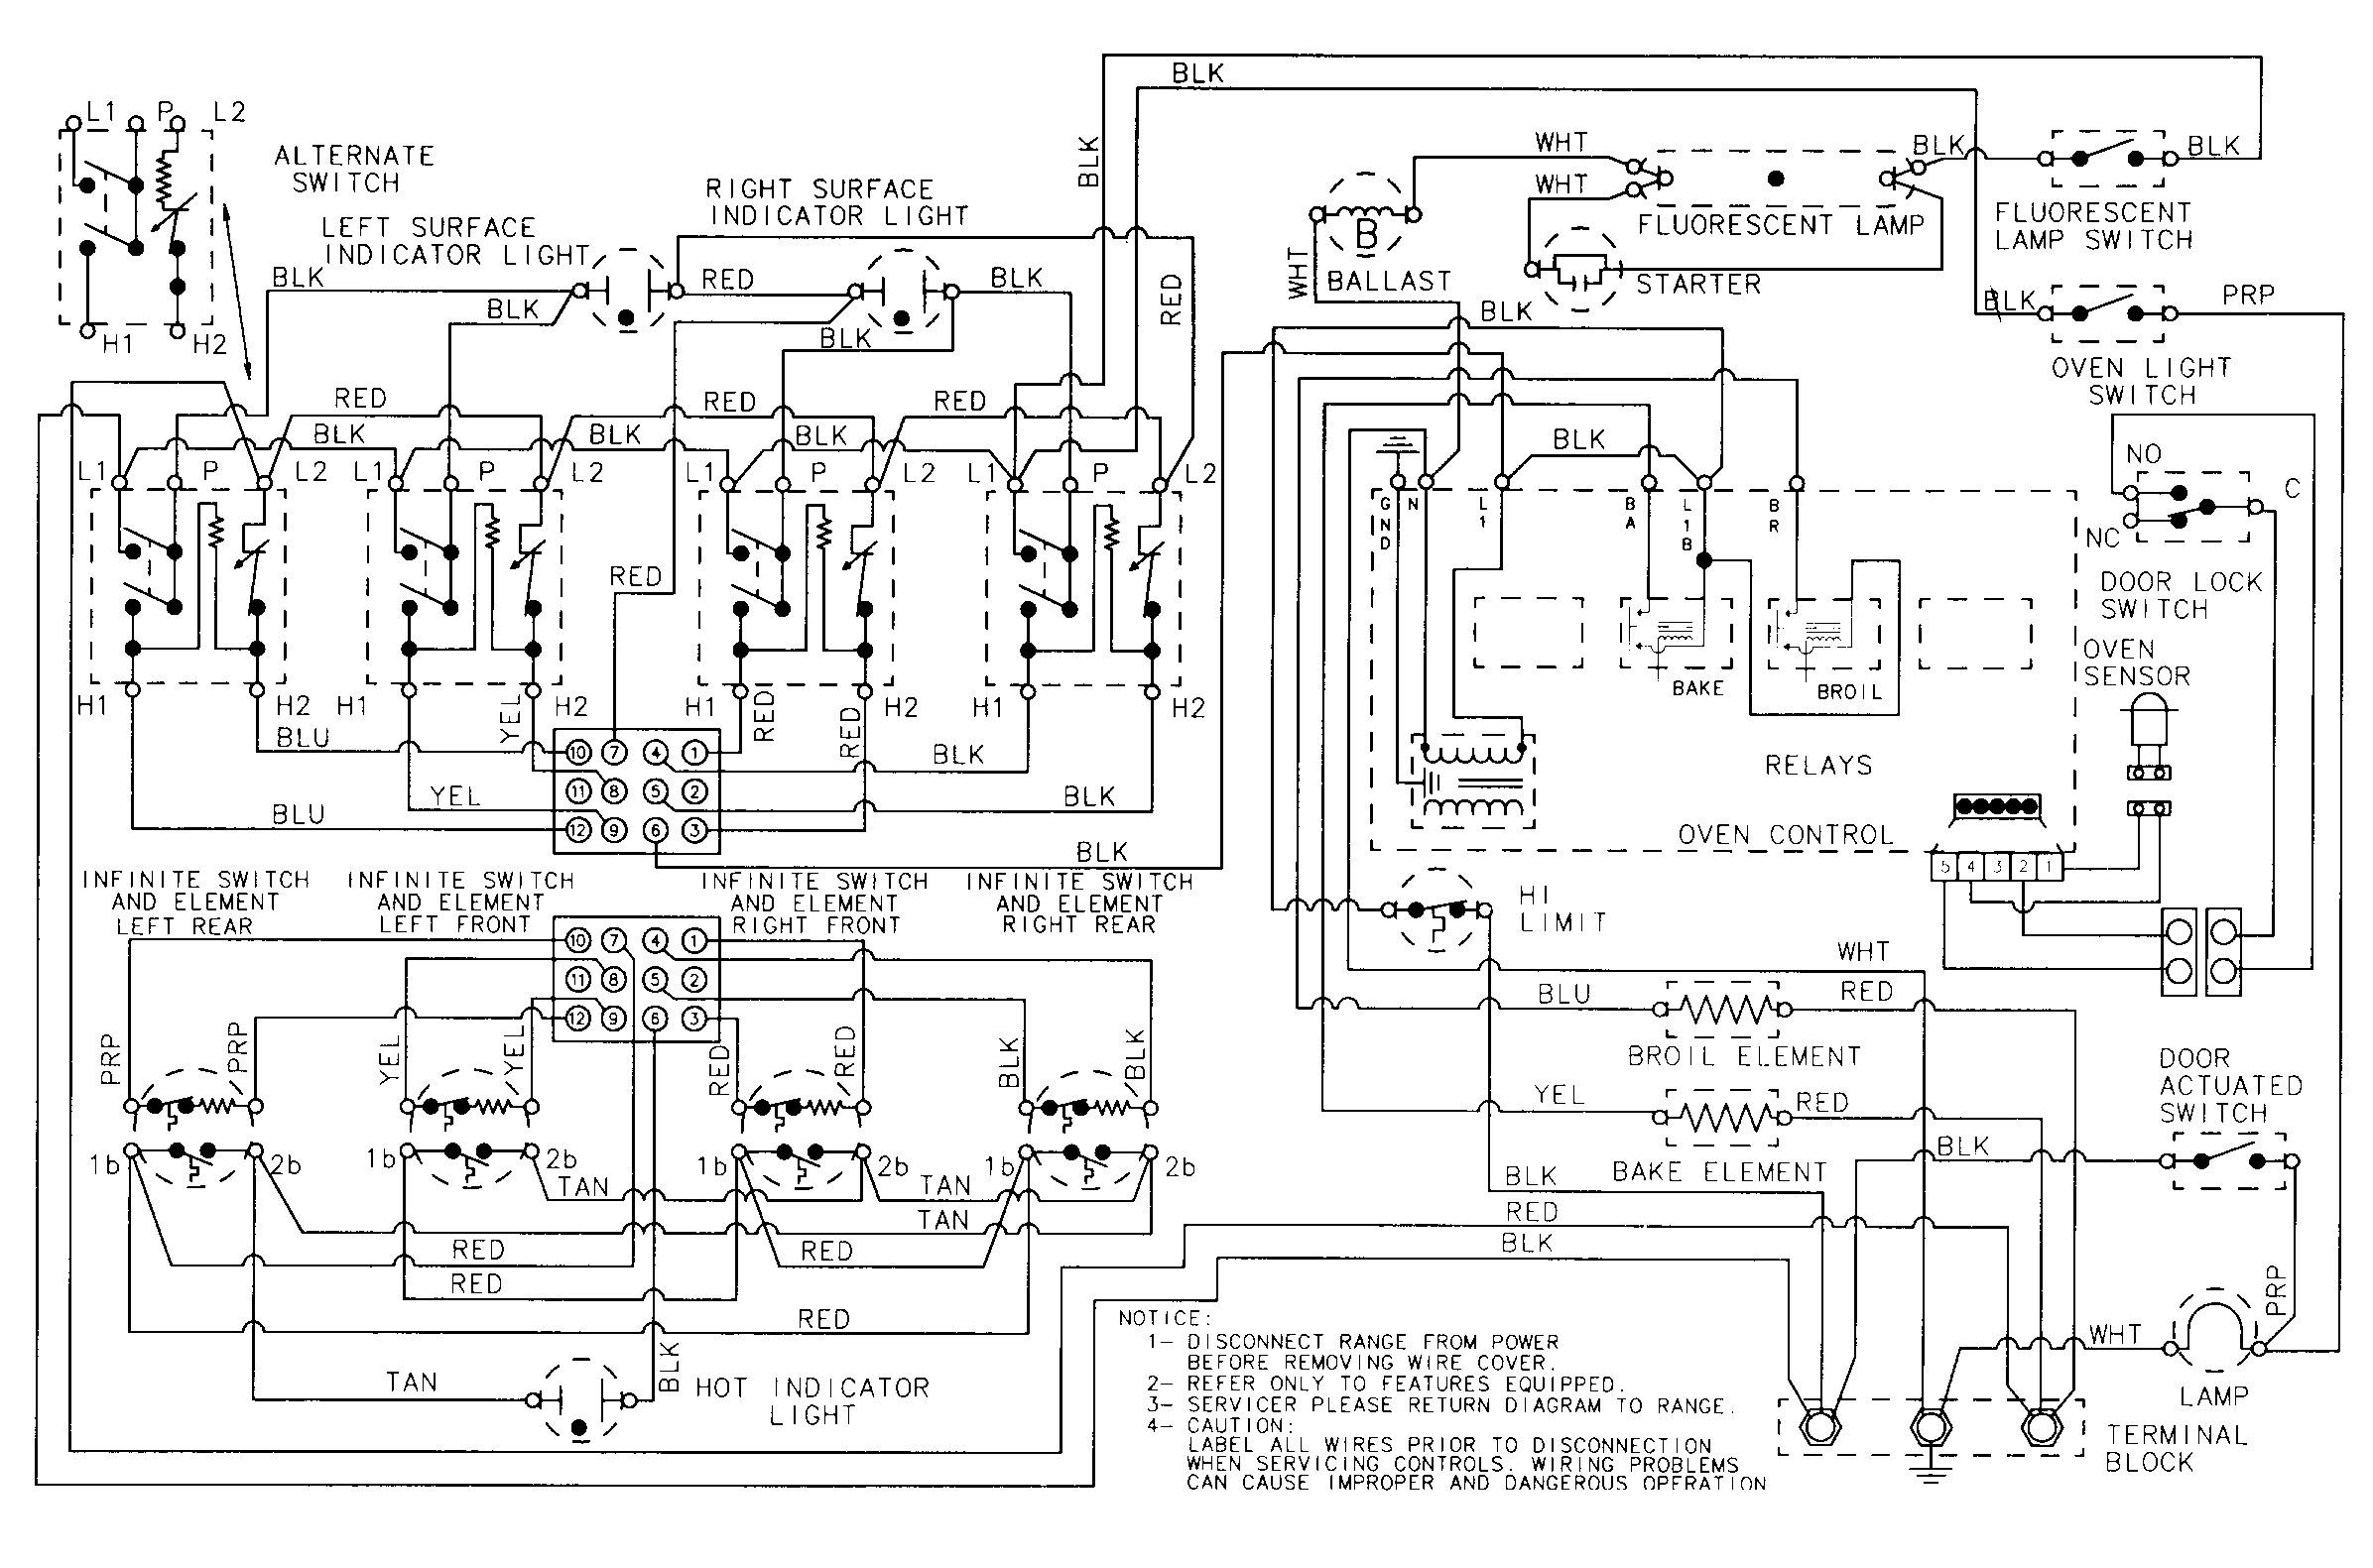 dryer wiring diagram schematic Download-Wiring Diagram Appliance Dryer Refrence Whirlpool Gas Dryer Wiring Diagram Collection 5-j